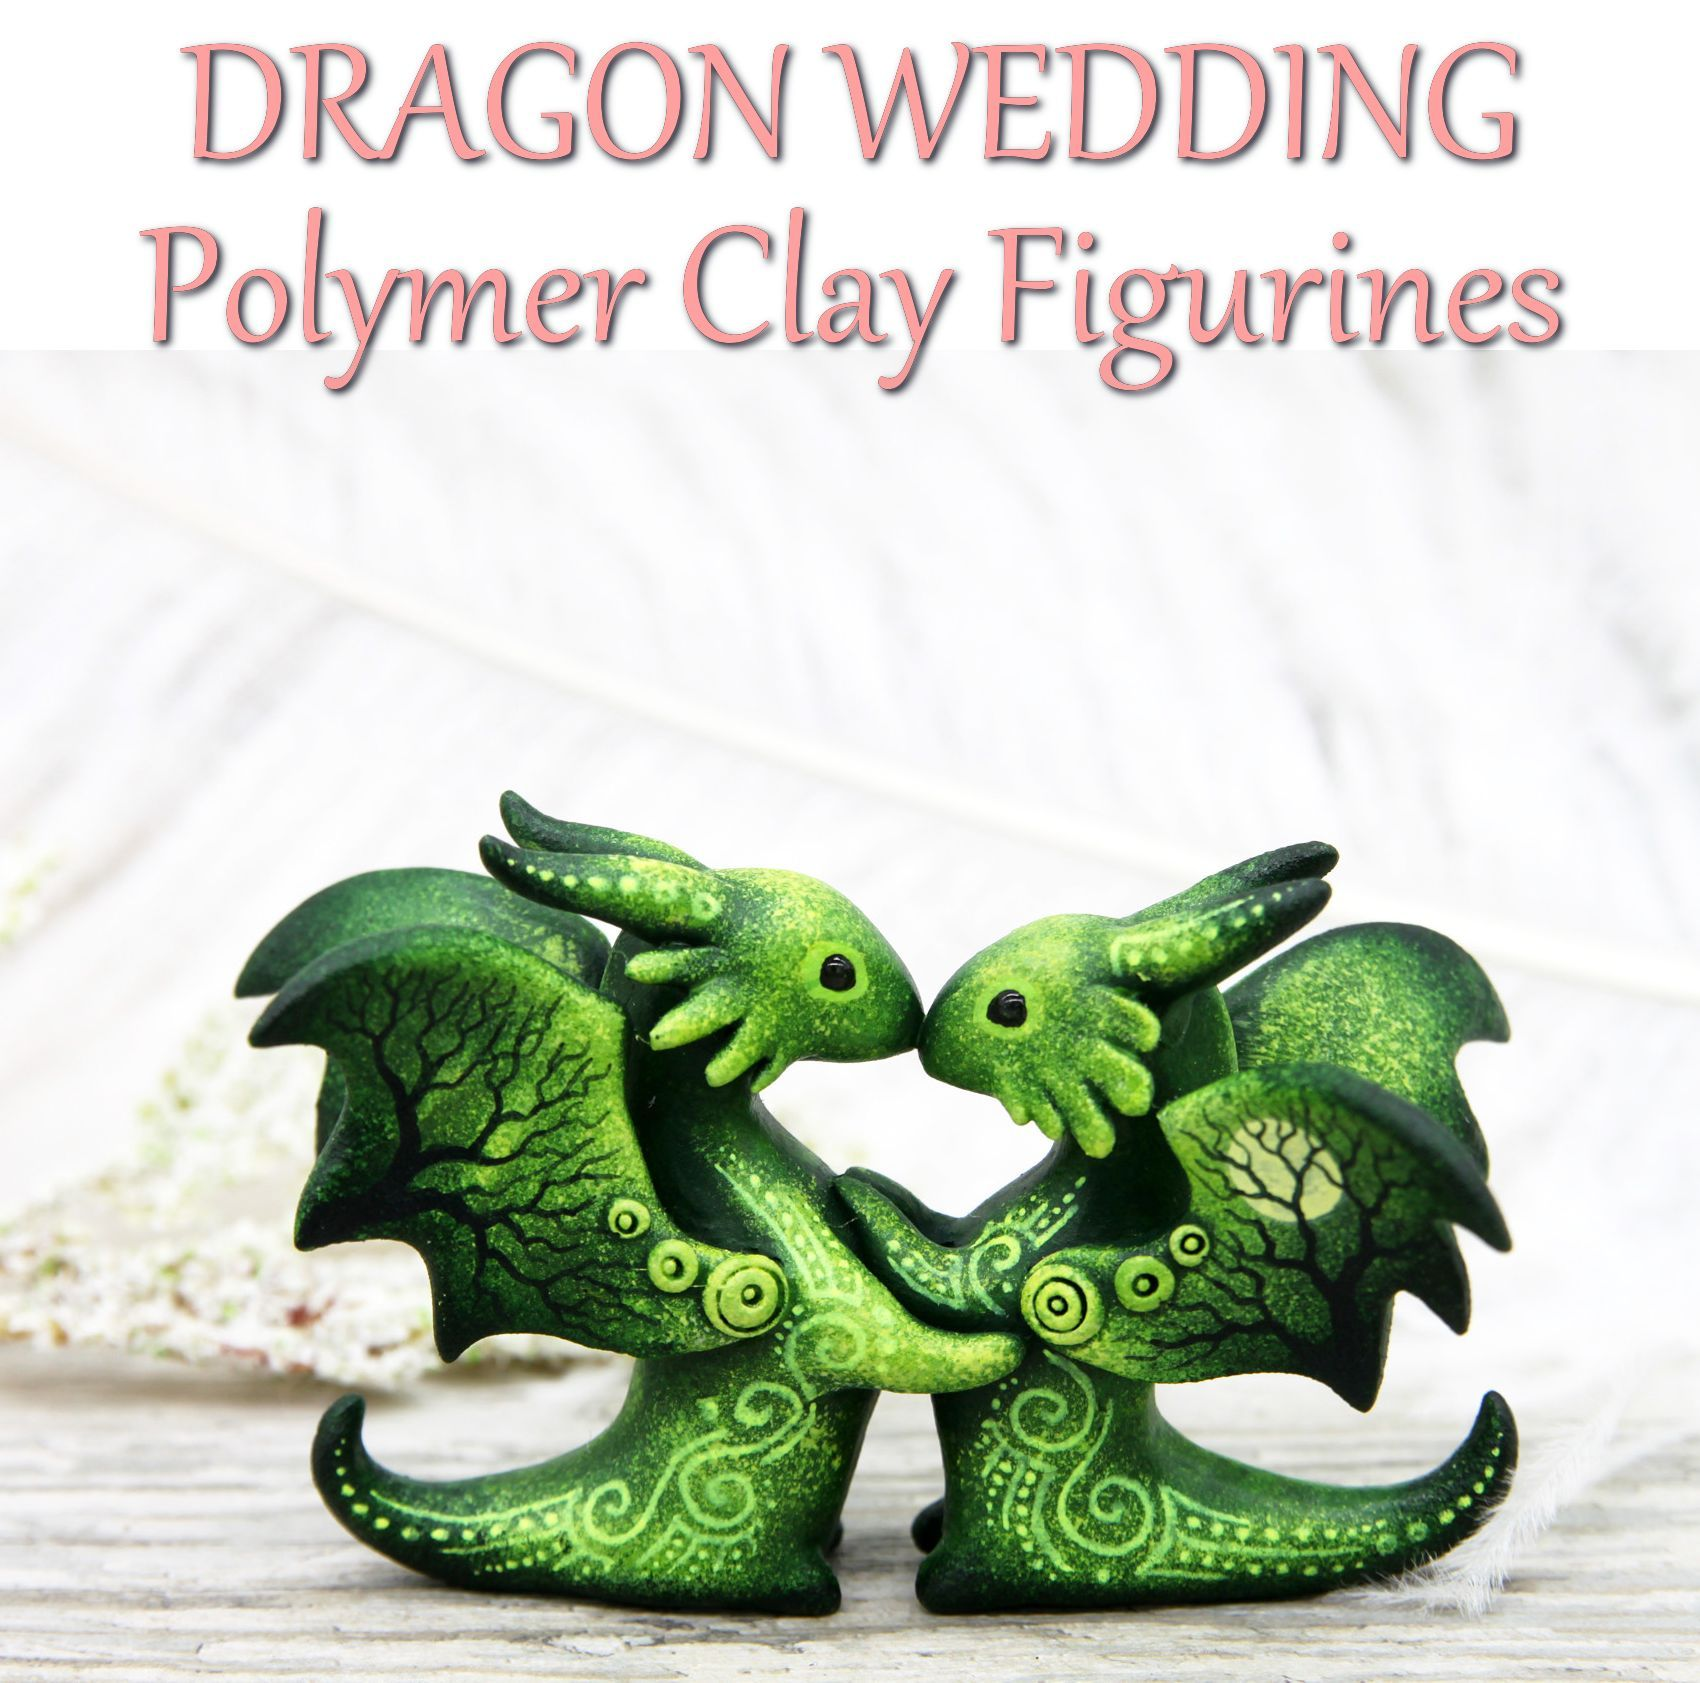 Wedding Cake Topper Couple Dragons Love Figurine By Evgeny Hontor Cake Topper Wedding Couple Dragon Wedding Clay Figurine